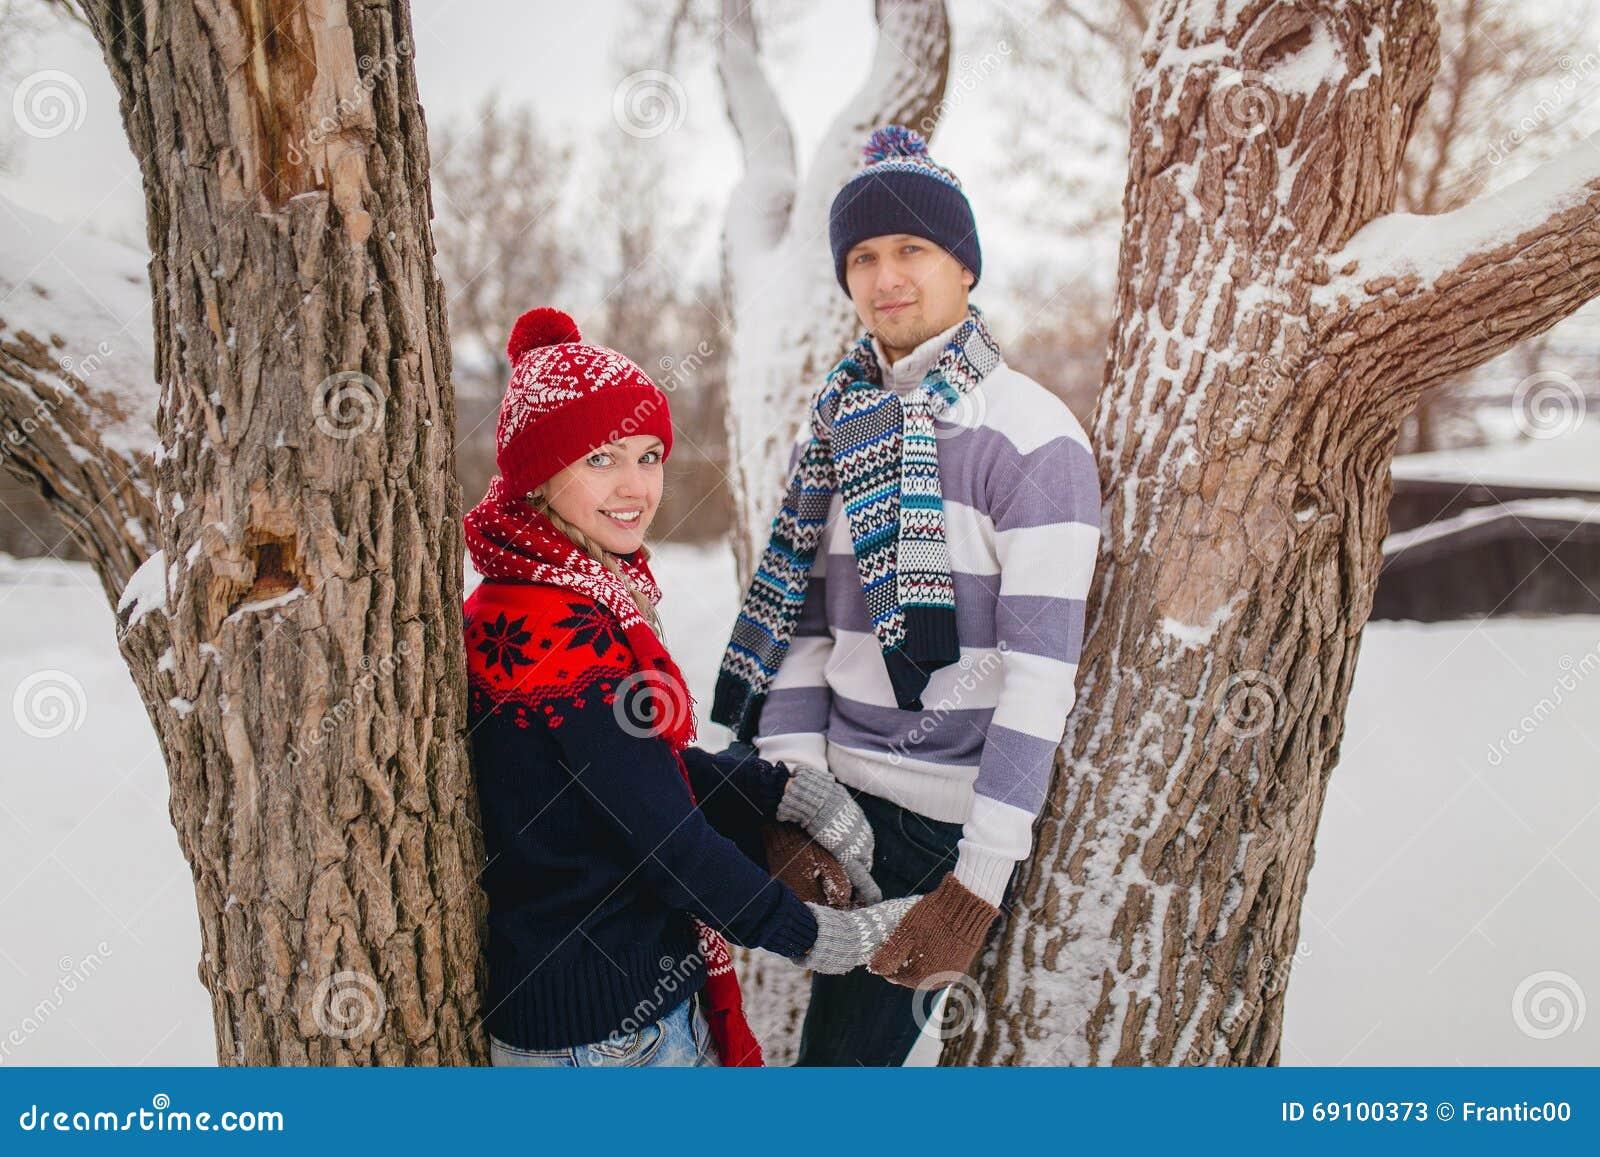 Junge Paare In Gestrickter Kleidung In Winter Park